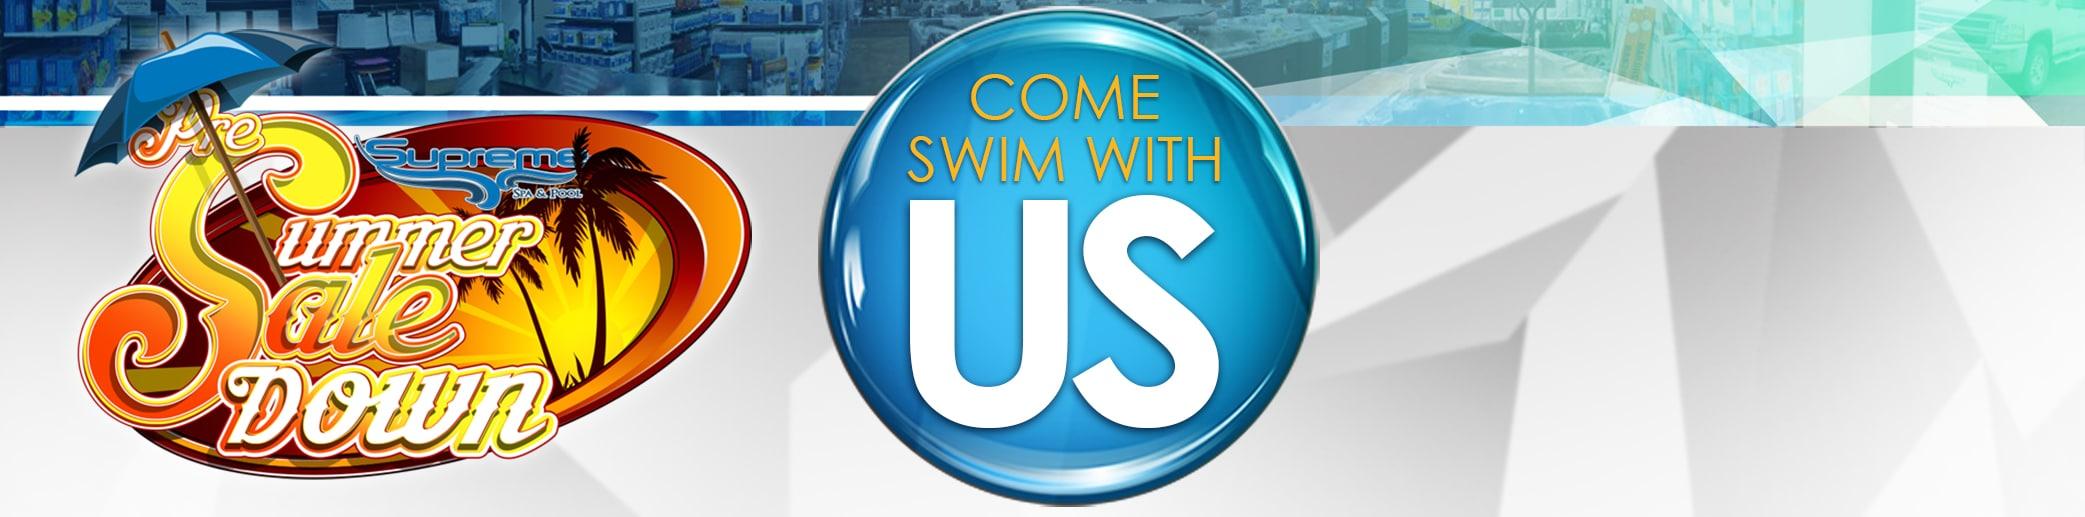 Supreme Spa Amp Pool Swimming Pools Hot Tubs Saunas